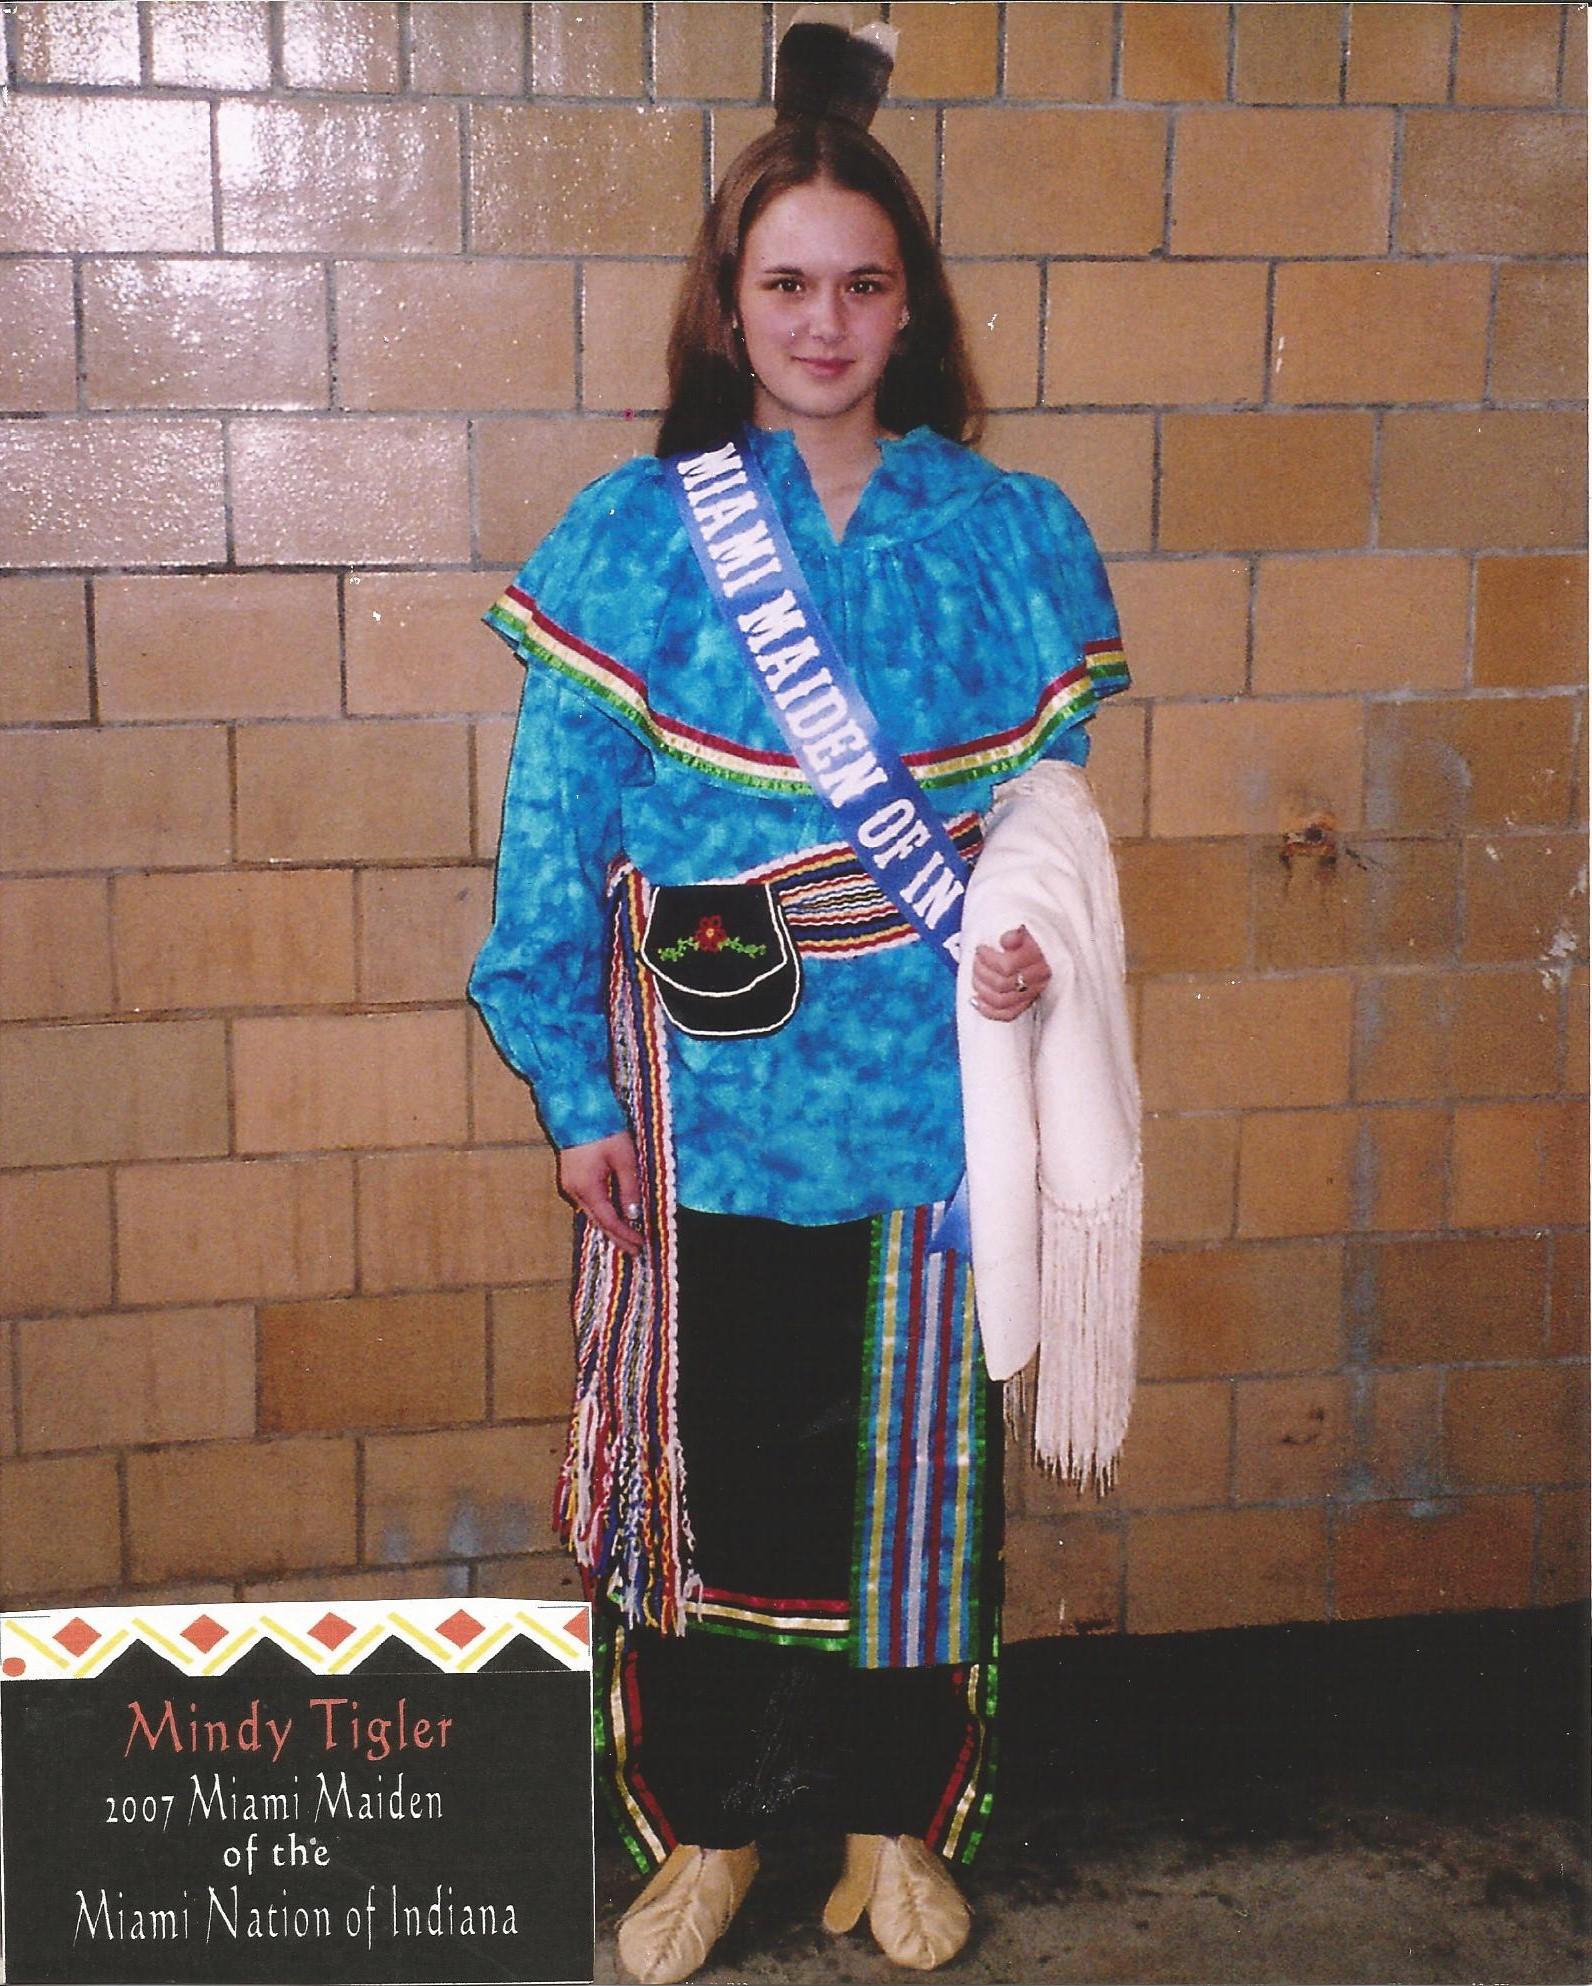 Miss Mindy Tigler - Miss Miami Maiden 2007